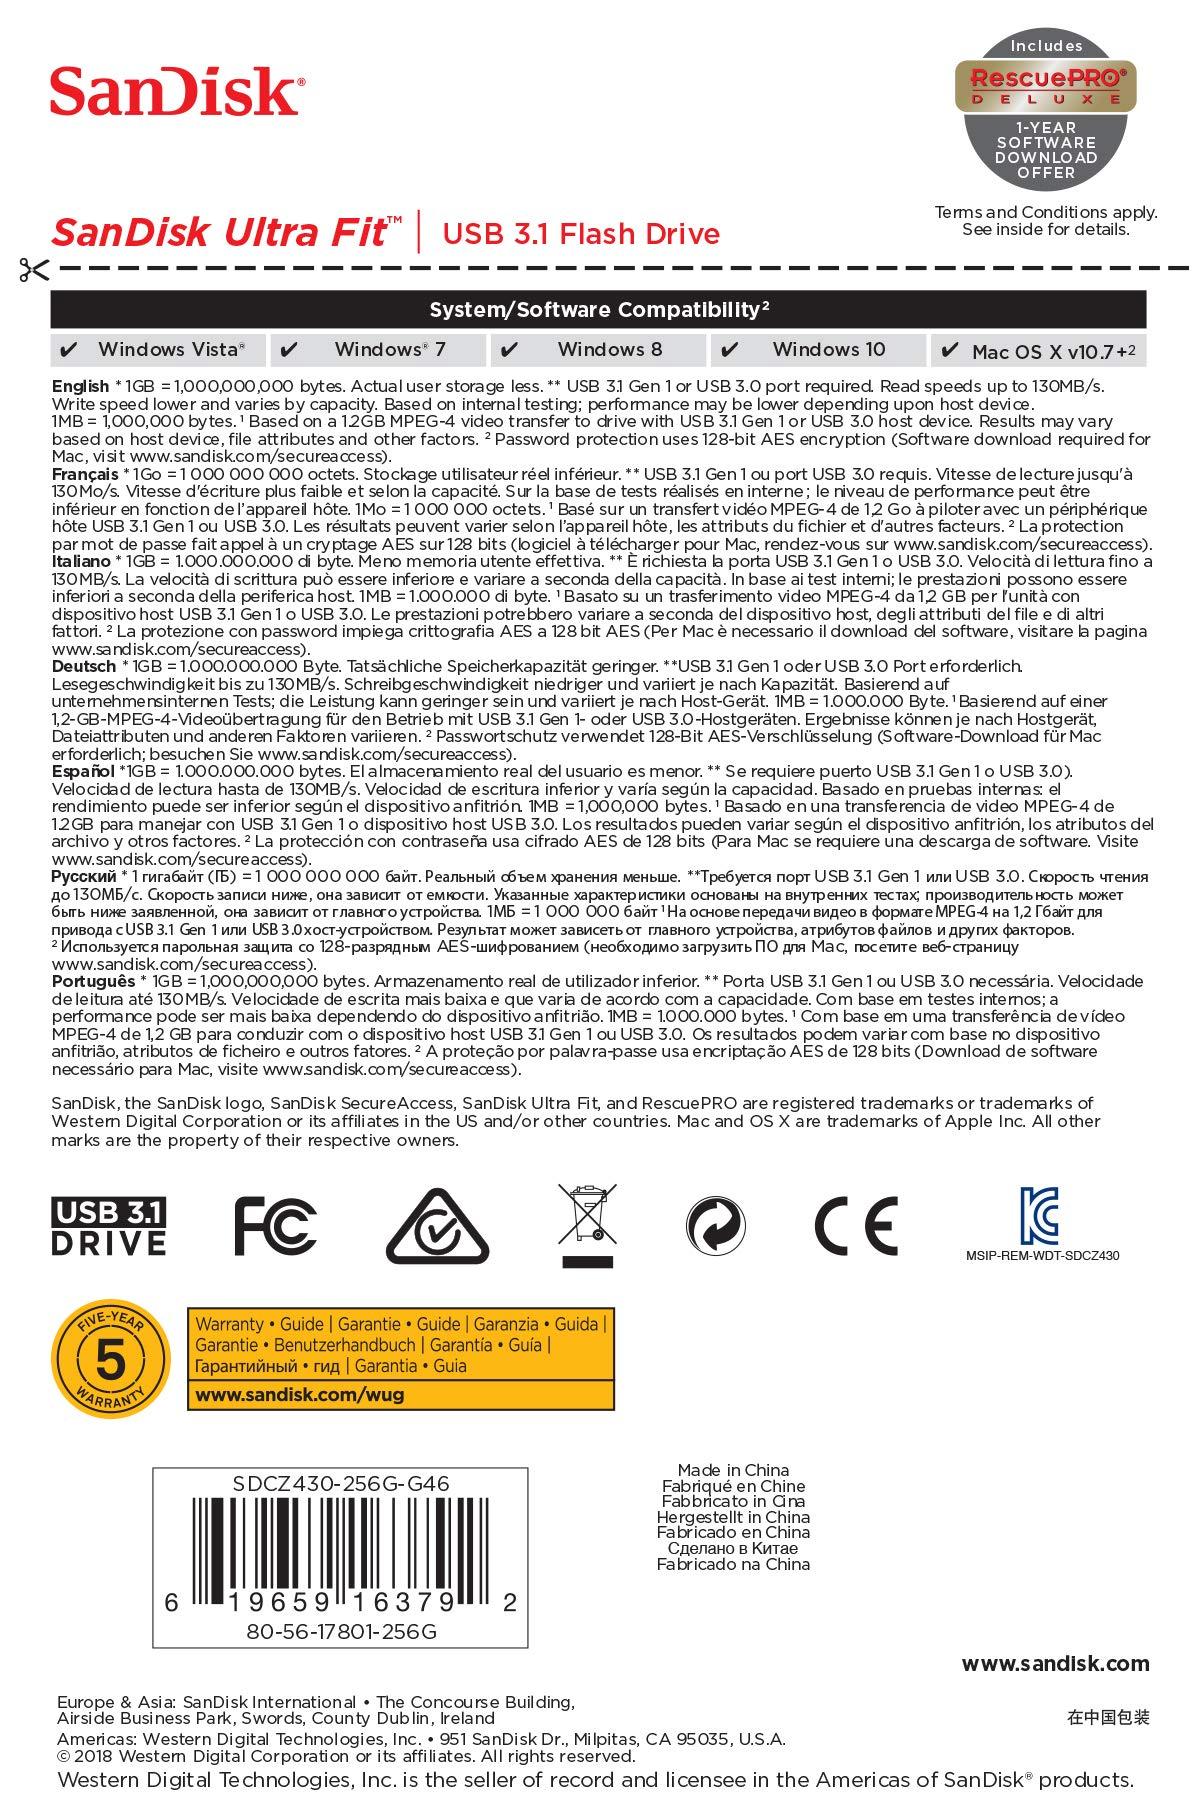 SanDisk 256GB Ultra Fit USB 3.1 Flash Drive - SDCZ430-256G-G46 by SanDisk (Image #6)